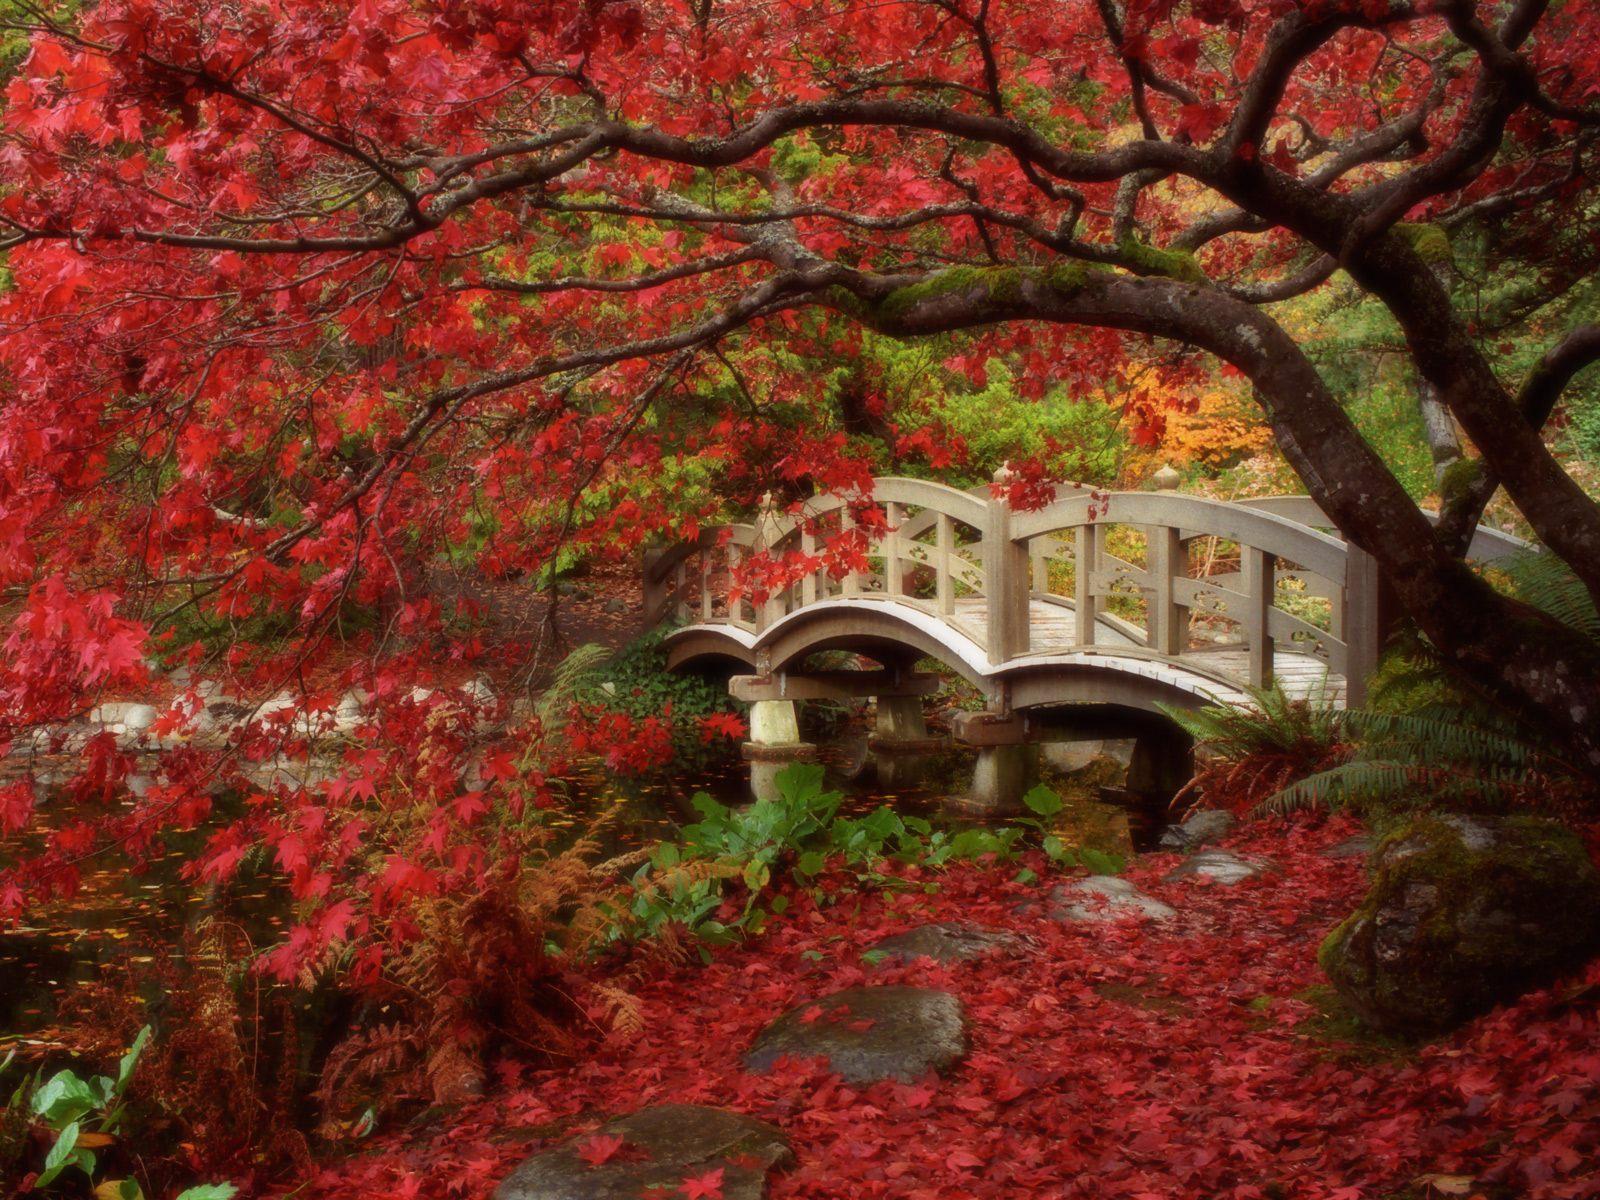 The-Kyoto-Gardens-Japan